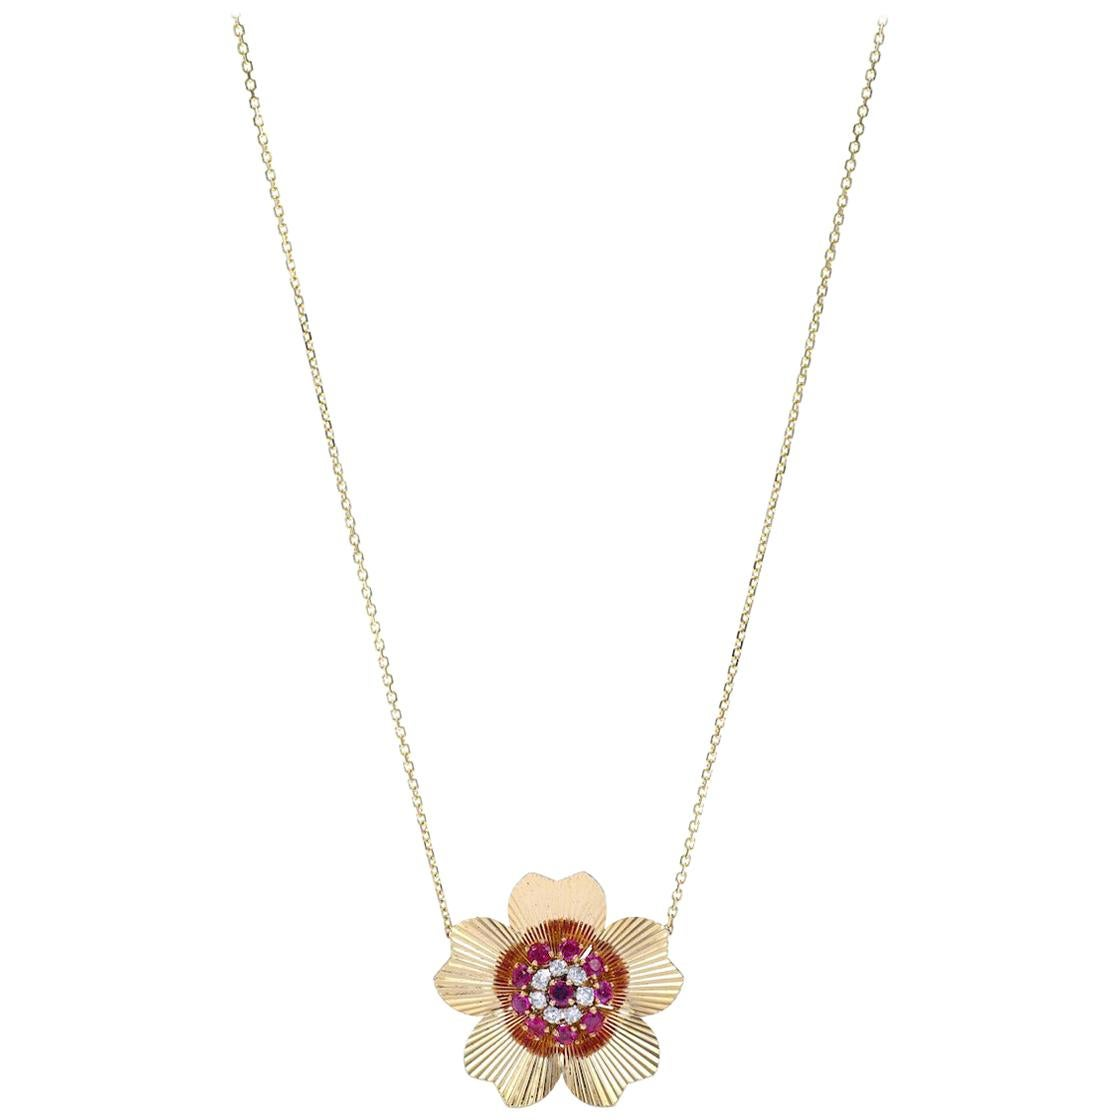 1950s Retro Diamond Ruby Yellow Gold Pendant Chain Necklace